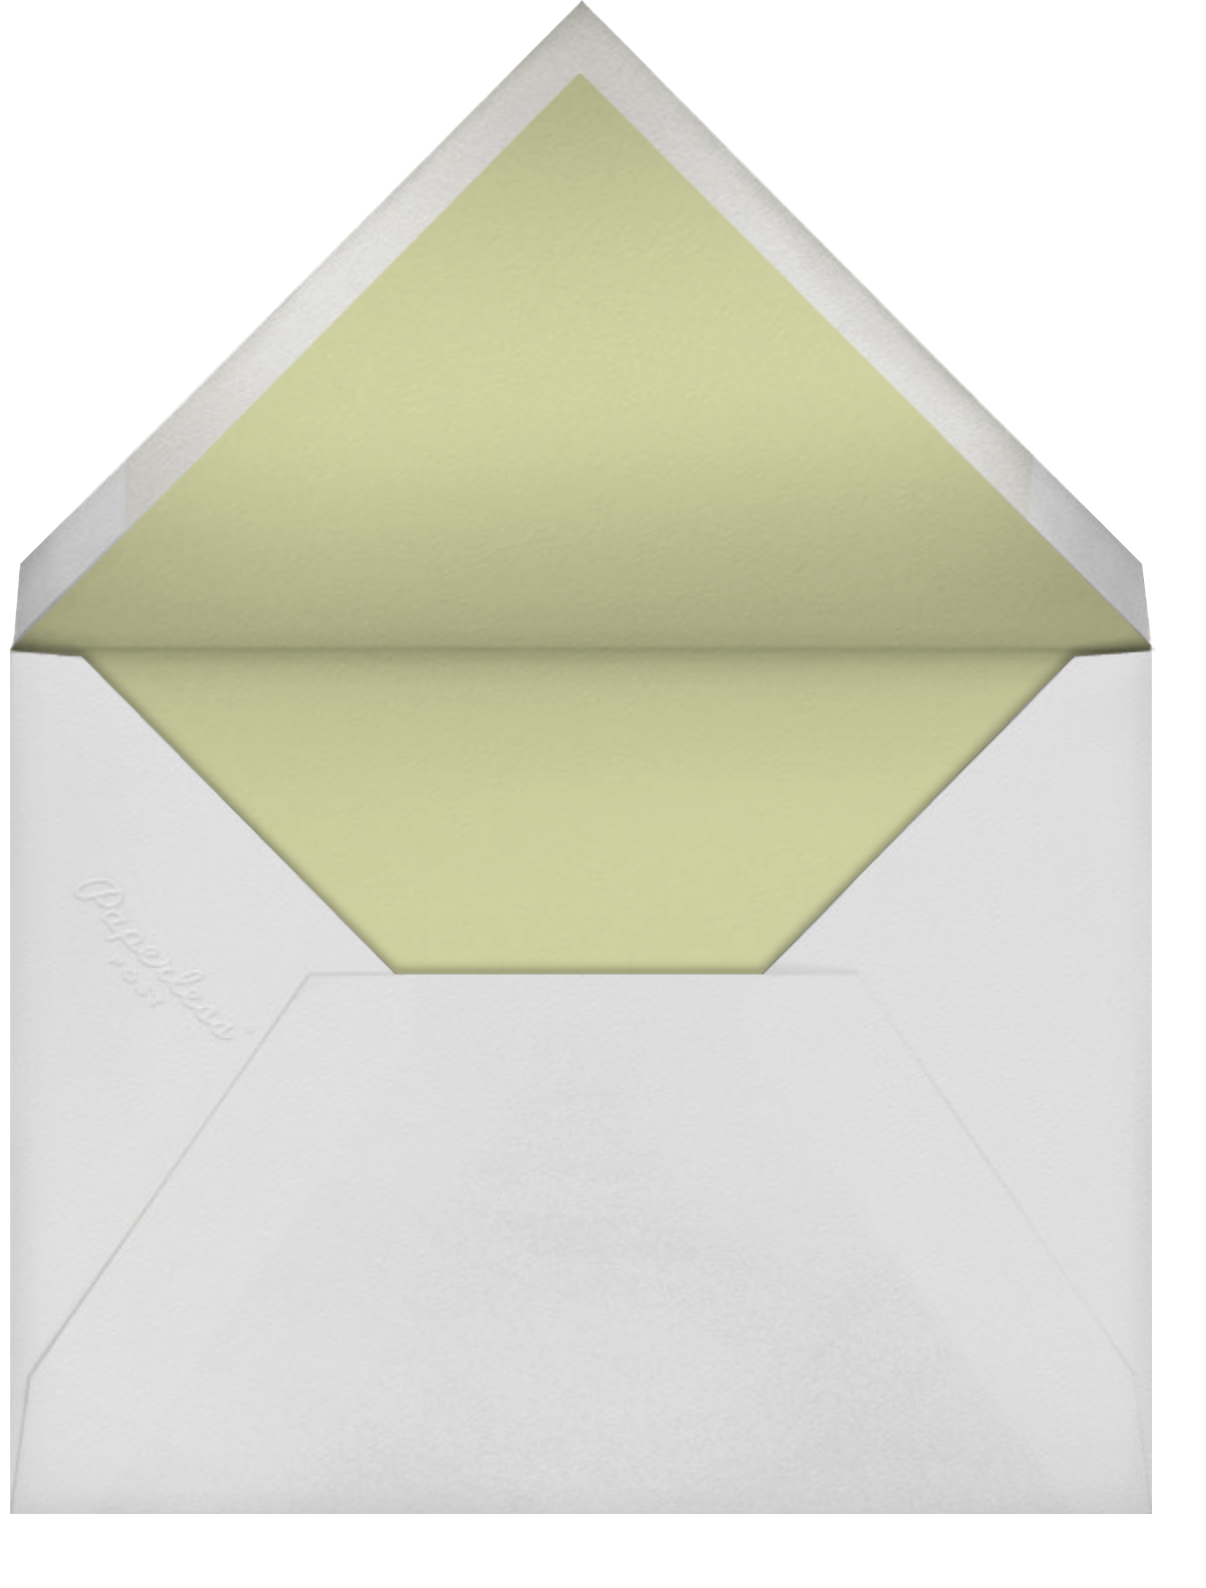 Saranac (Thank You) - Celery - Crane & Co. - Sympathy - envelope back